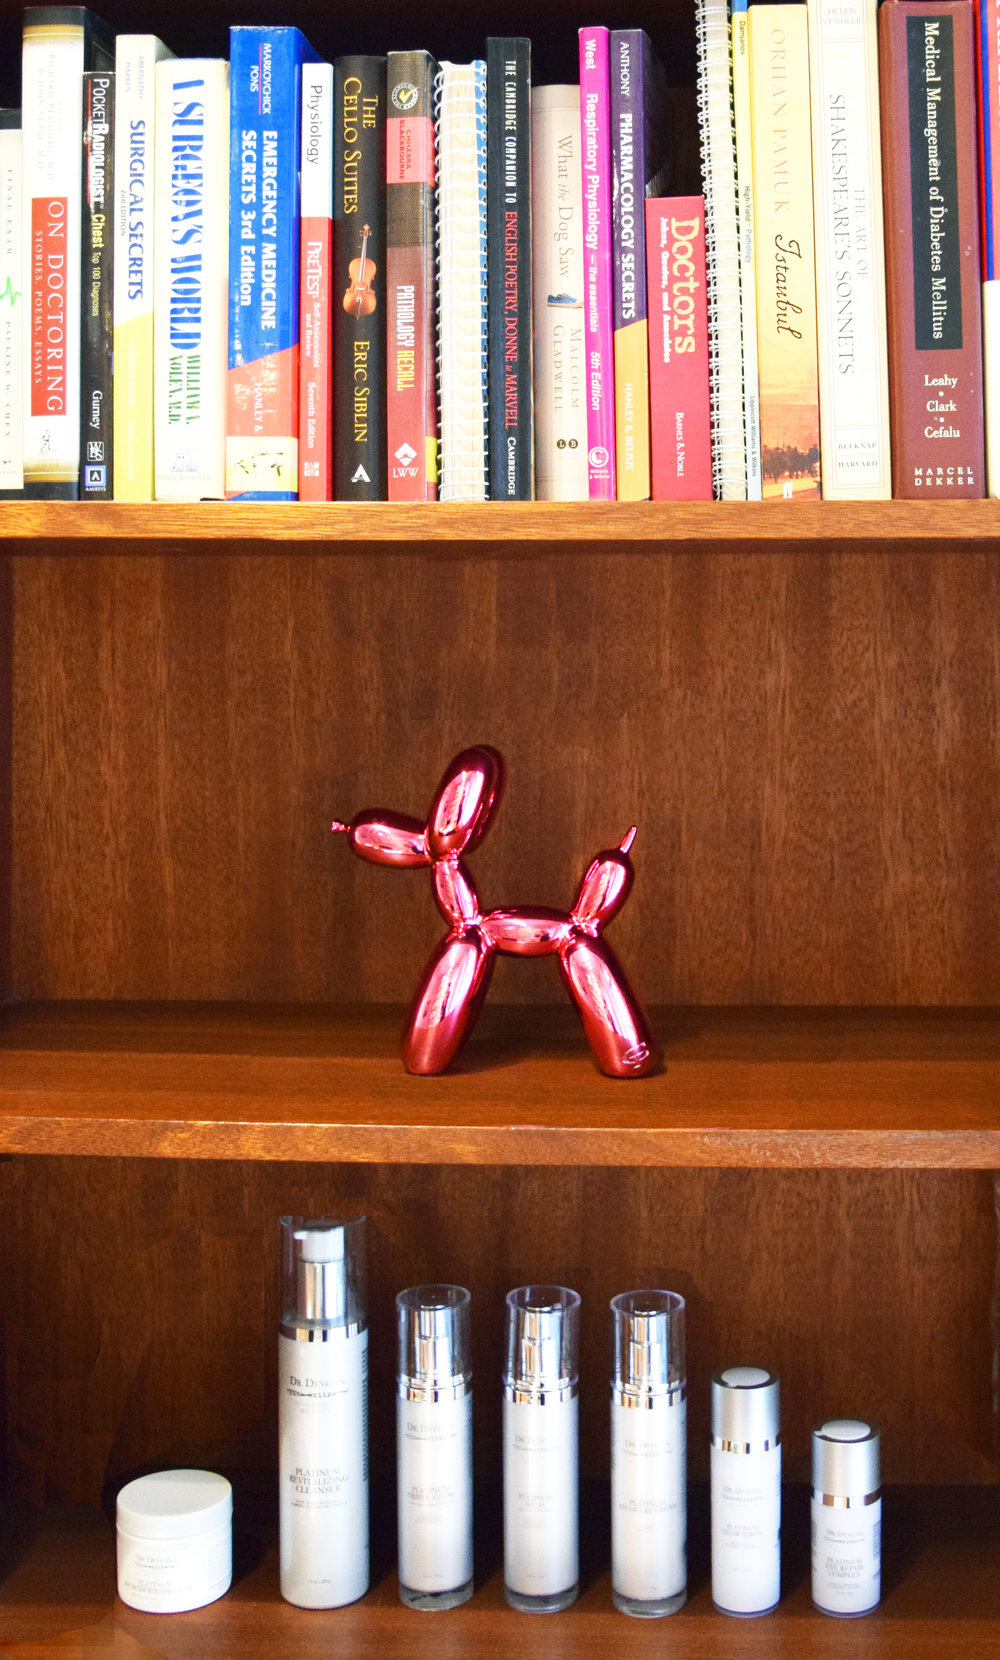 Jeff Koons's Balloon Dog